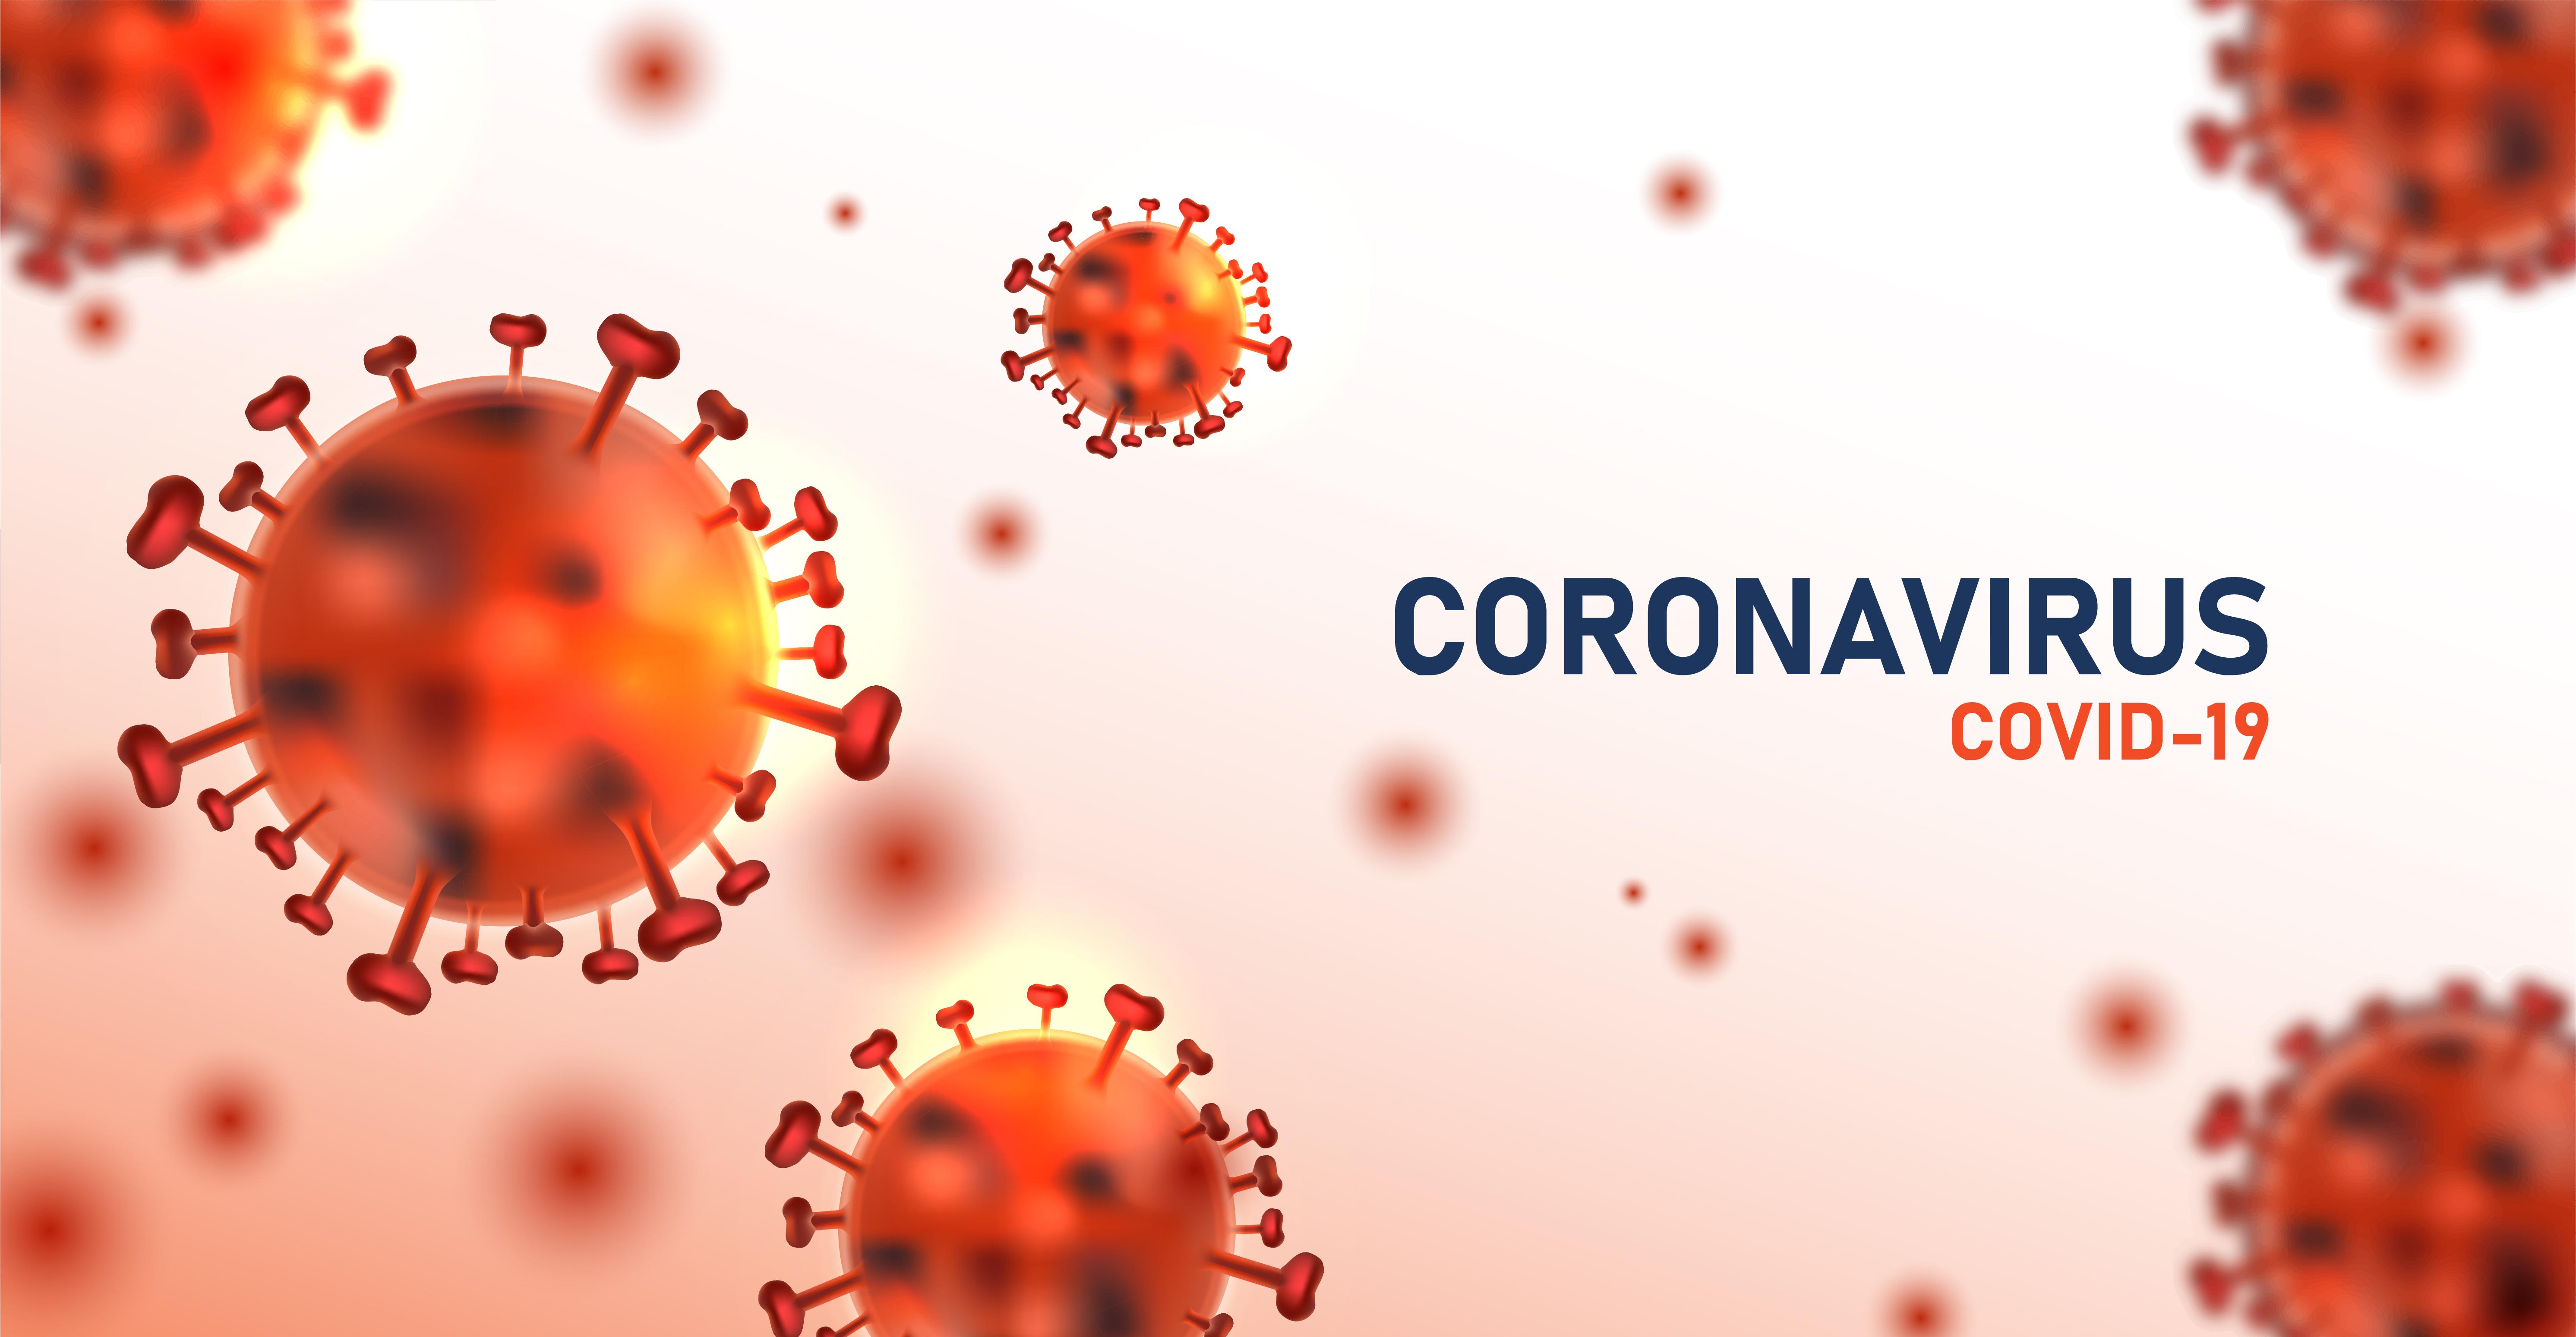 Red Coronavirus Infection Poster - Download Free Vectors ...